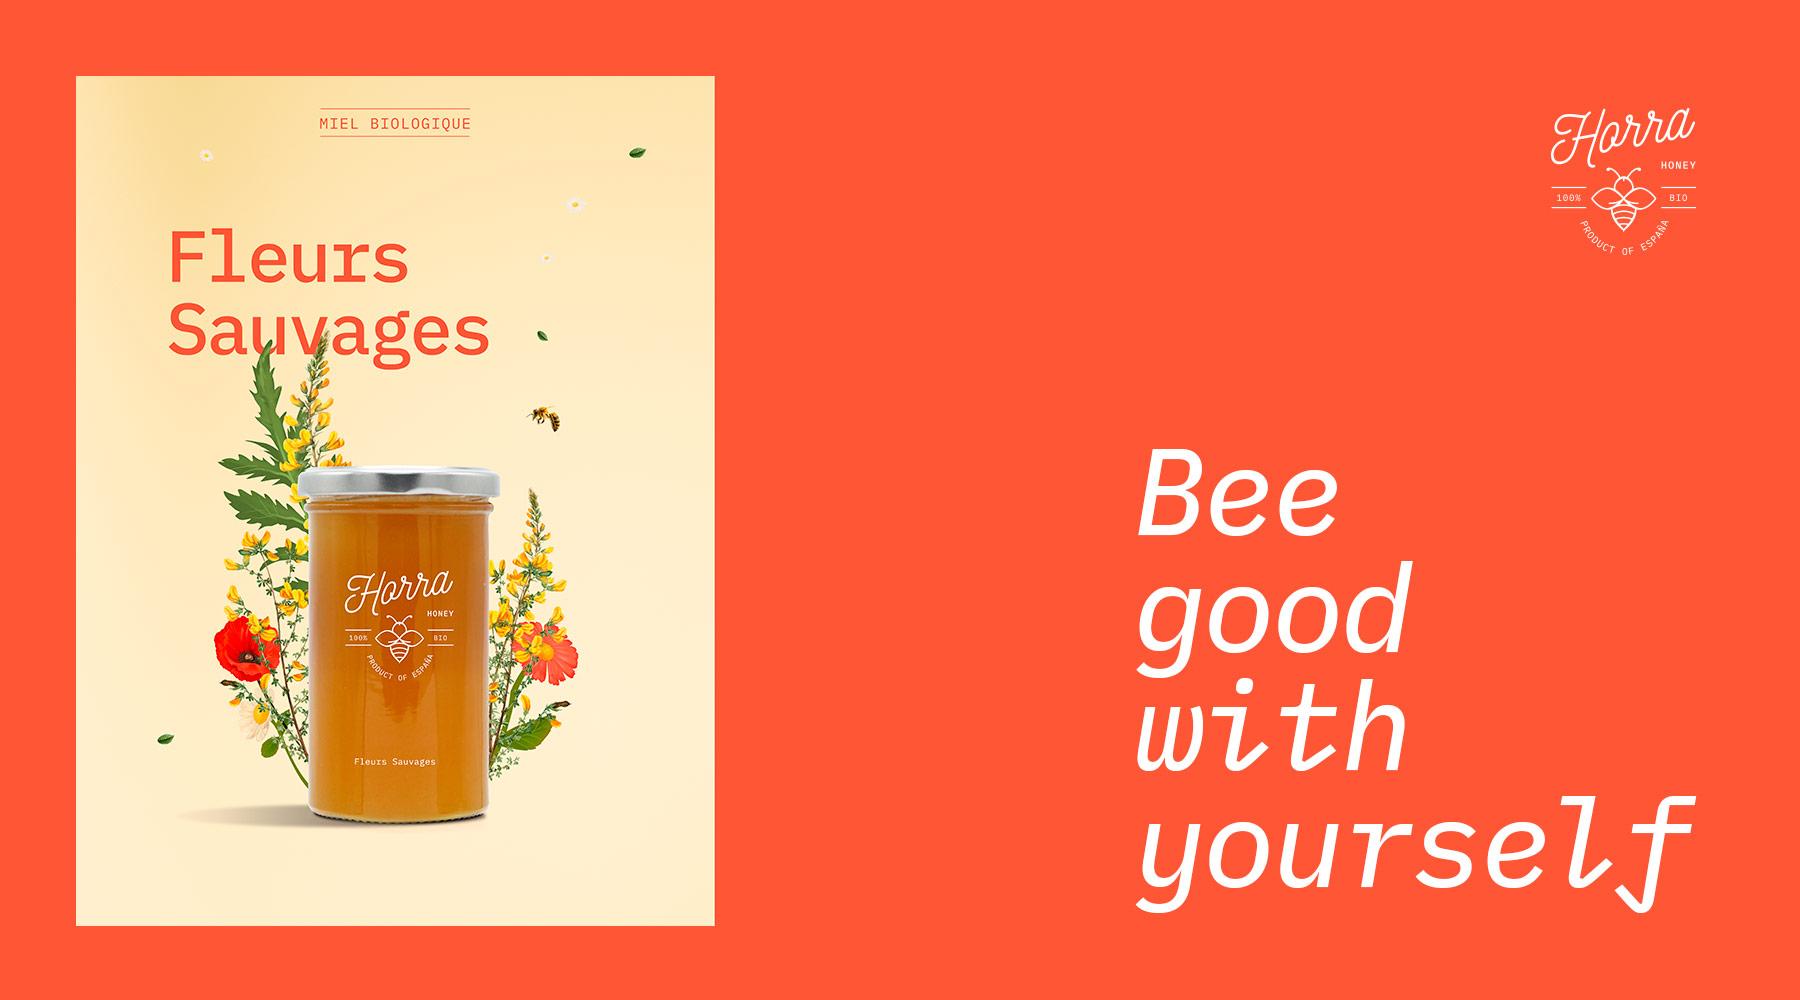 fleurs sauvages Horra Honey